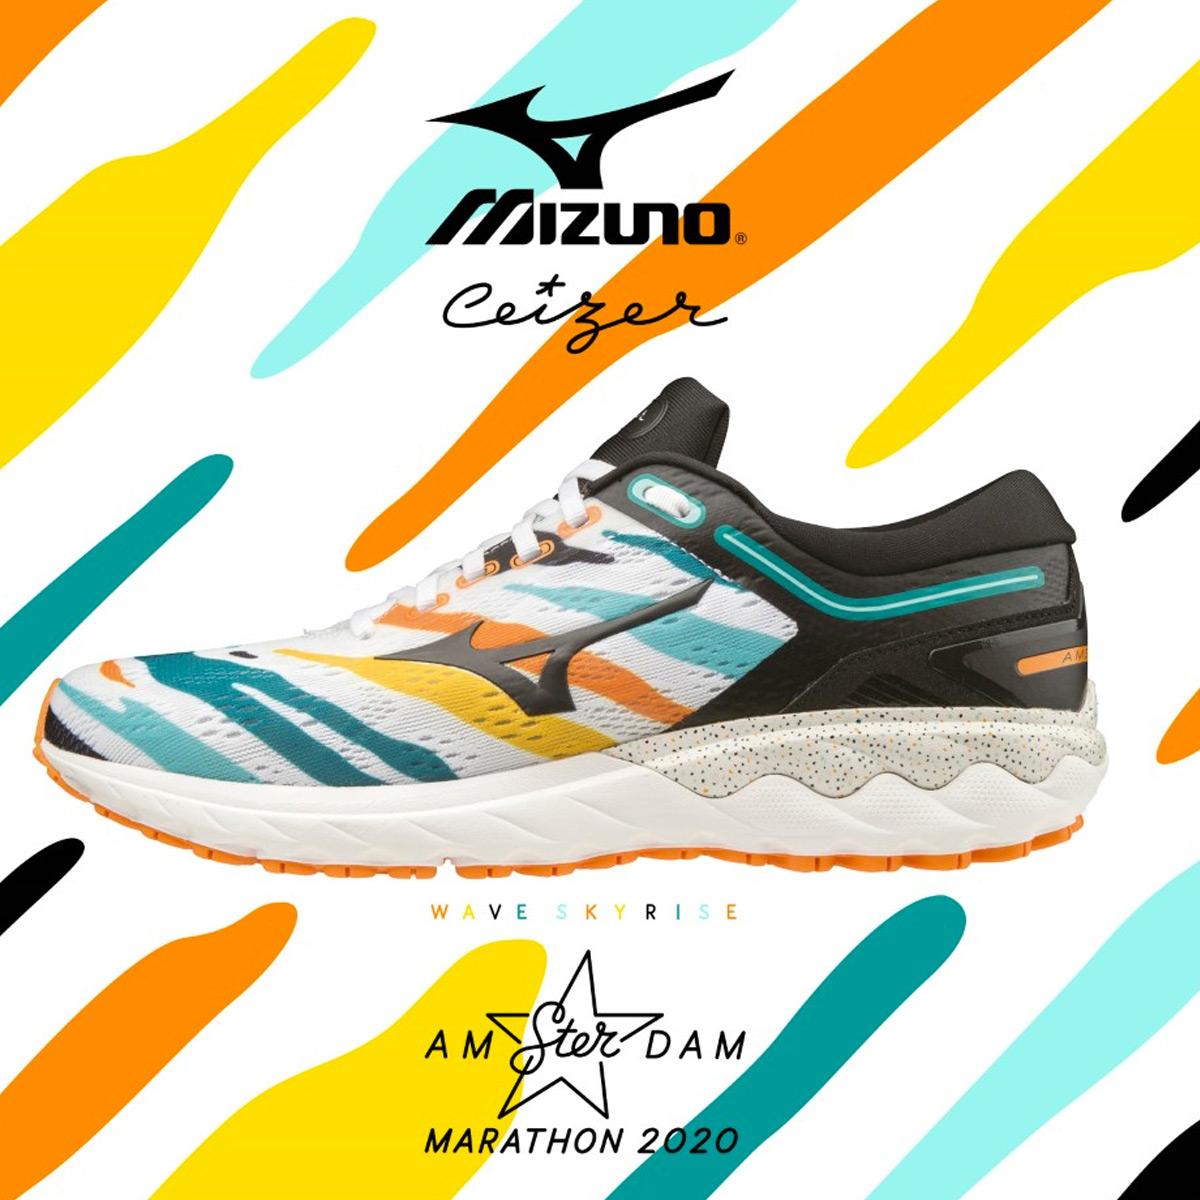 Mizuno Wave Skyrise x Ceizer